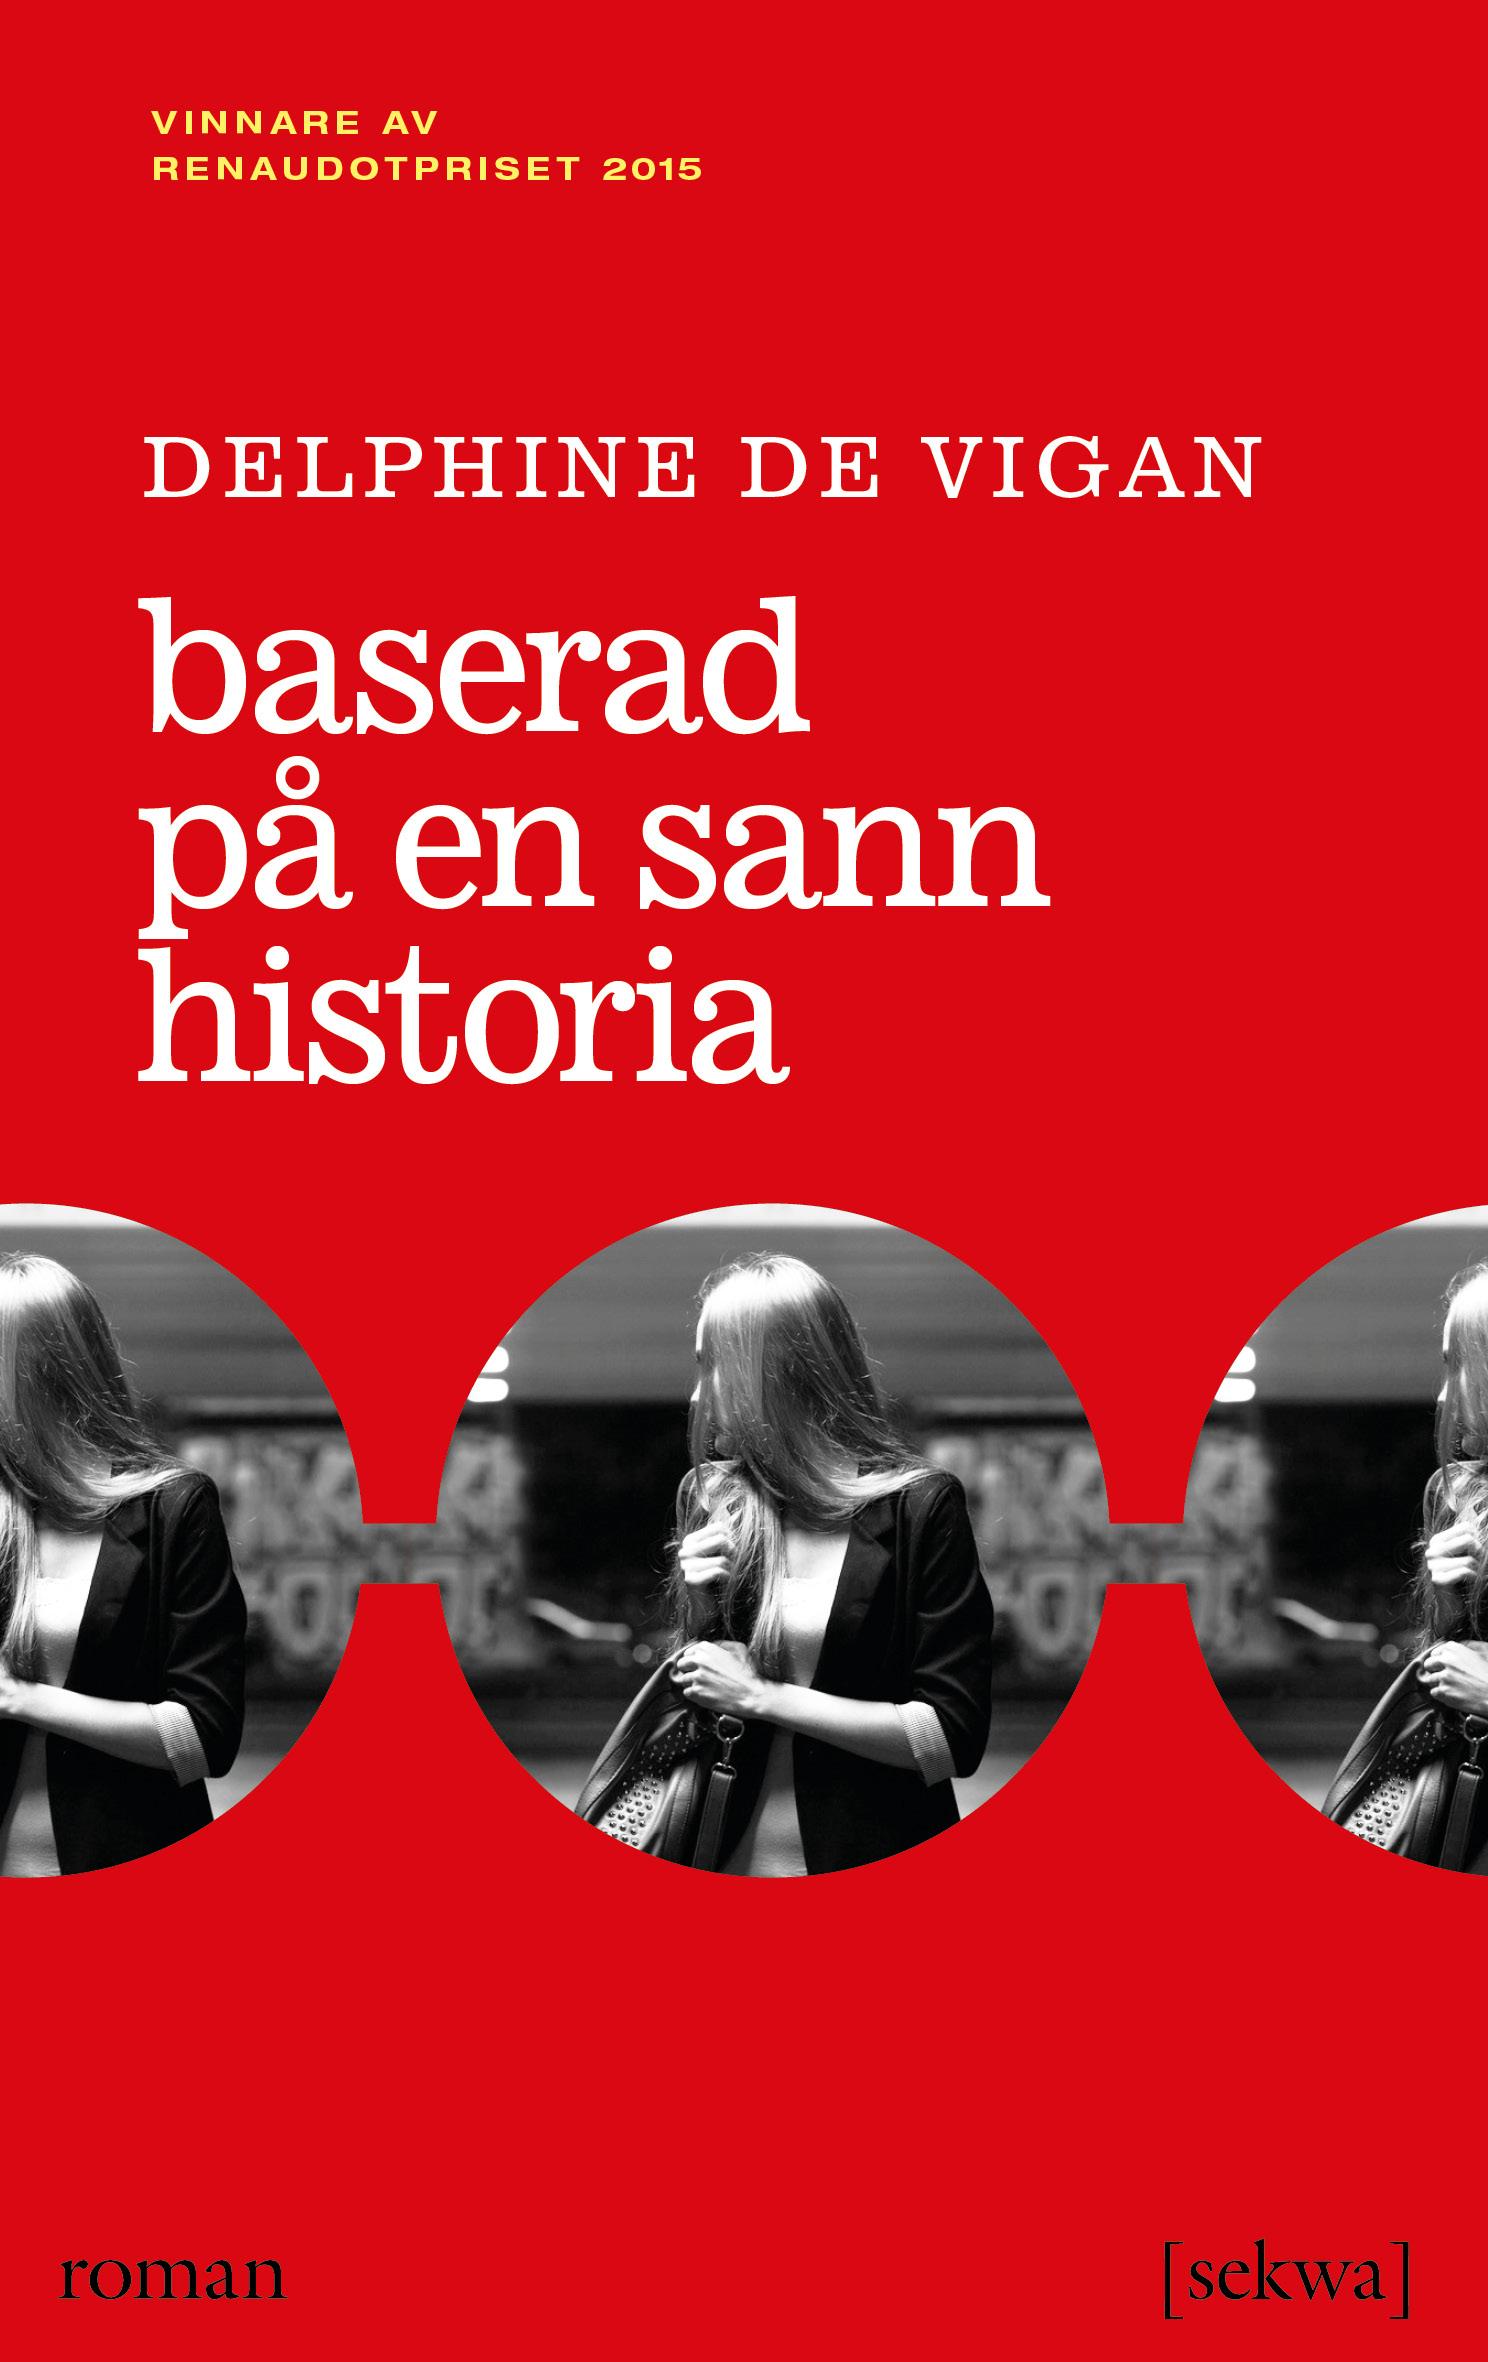 Delphine de Vigan: Baserad på en sann historia